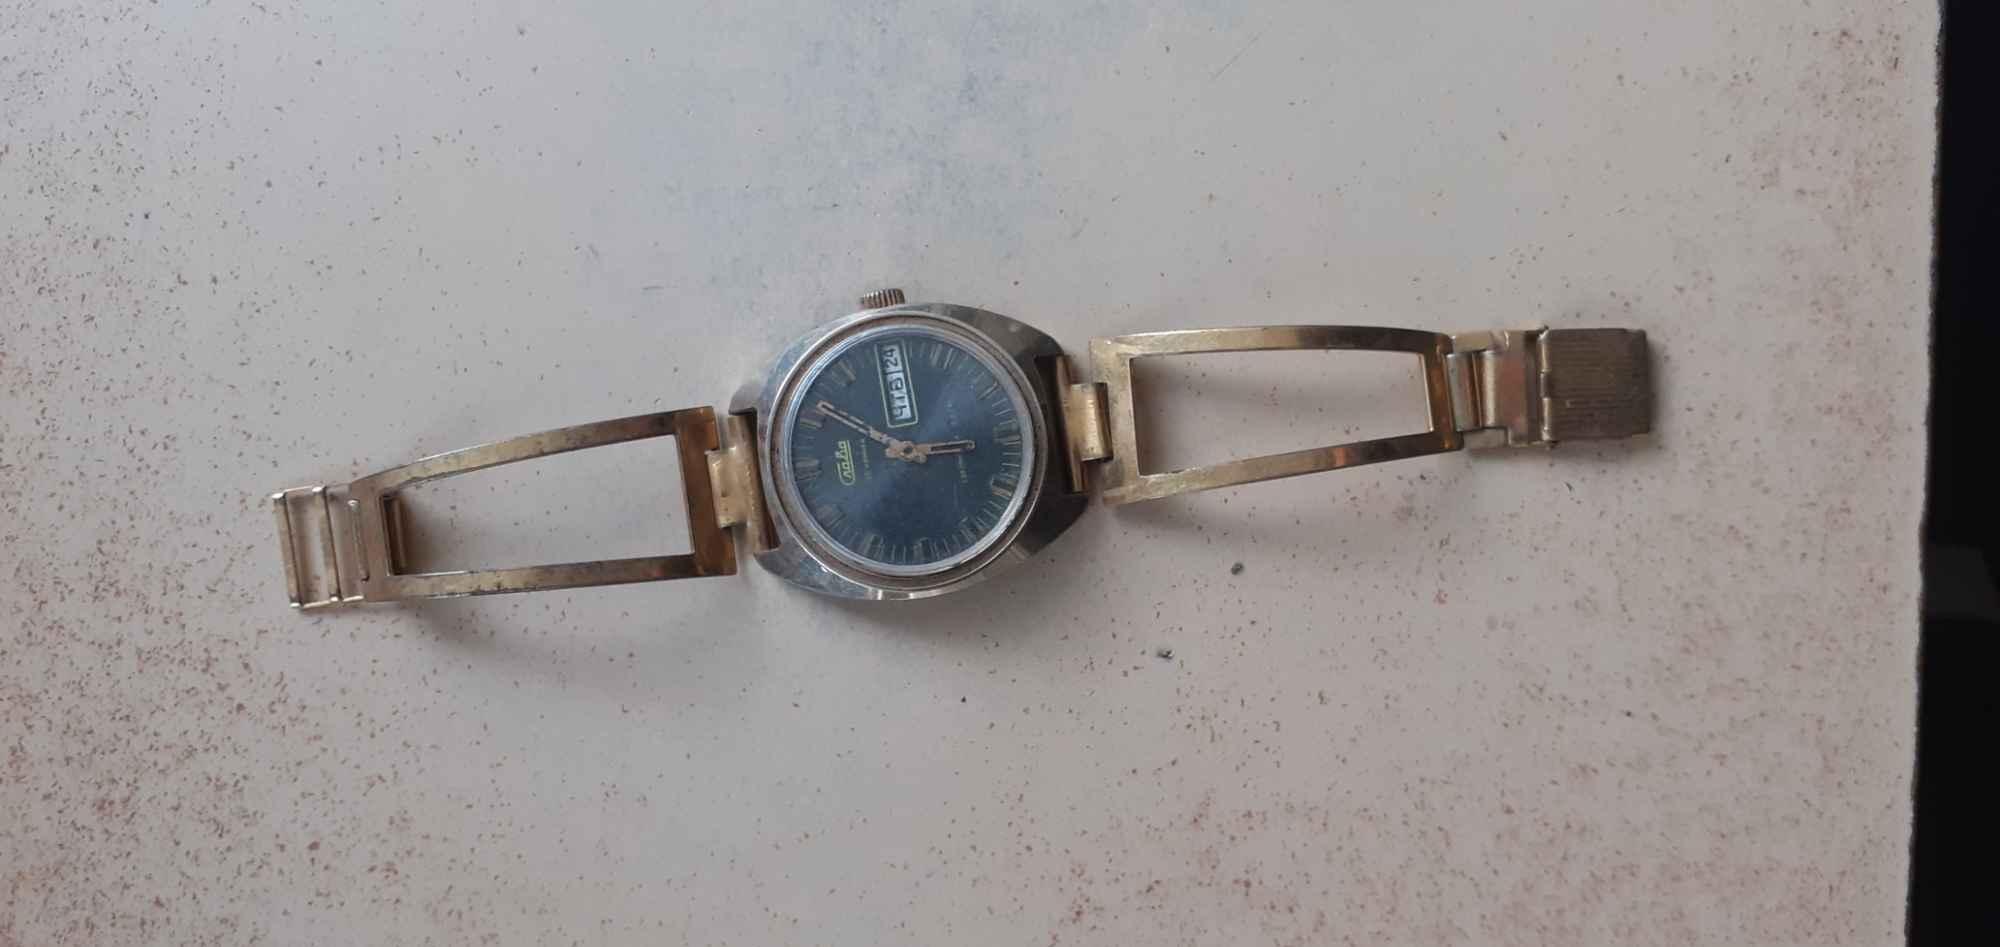 Zegarek Czerna - zdjęcie 1